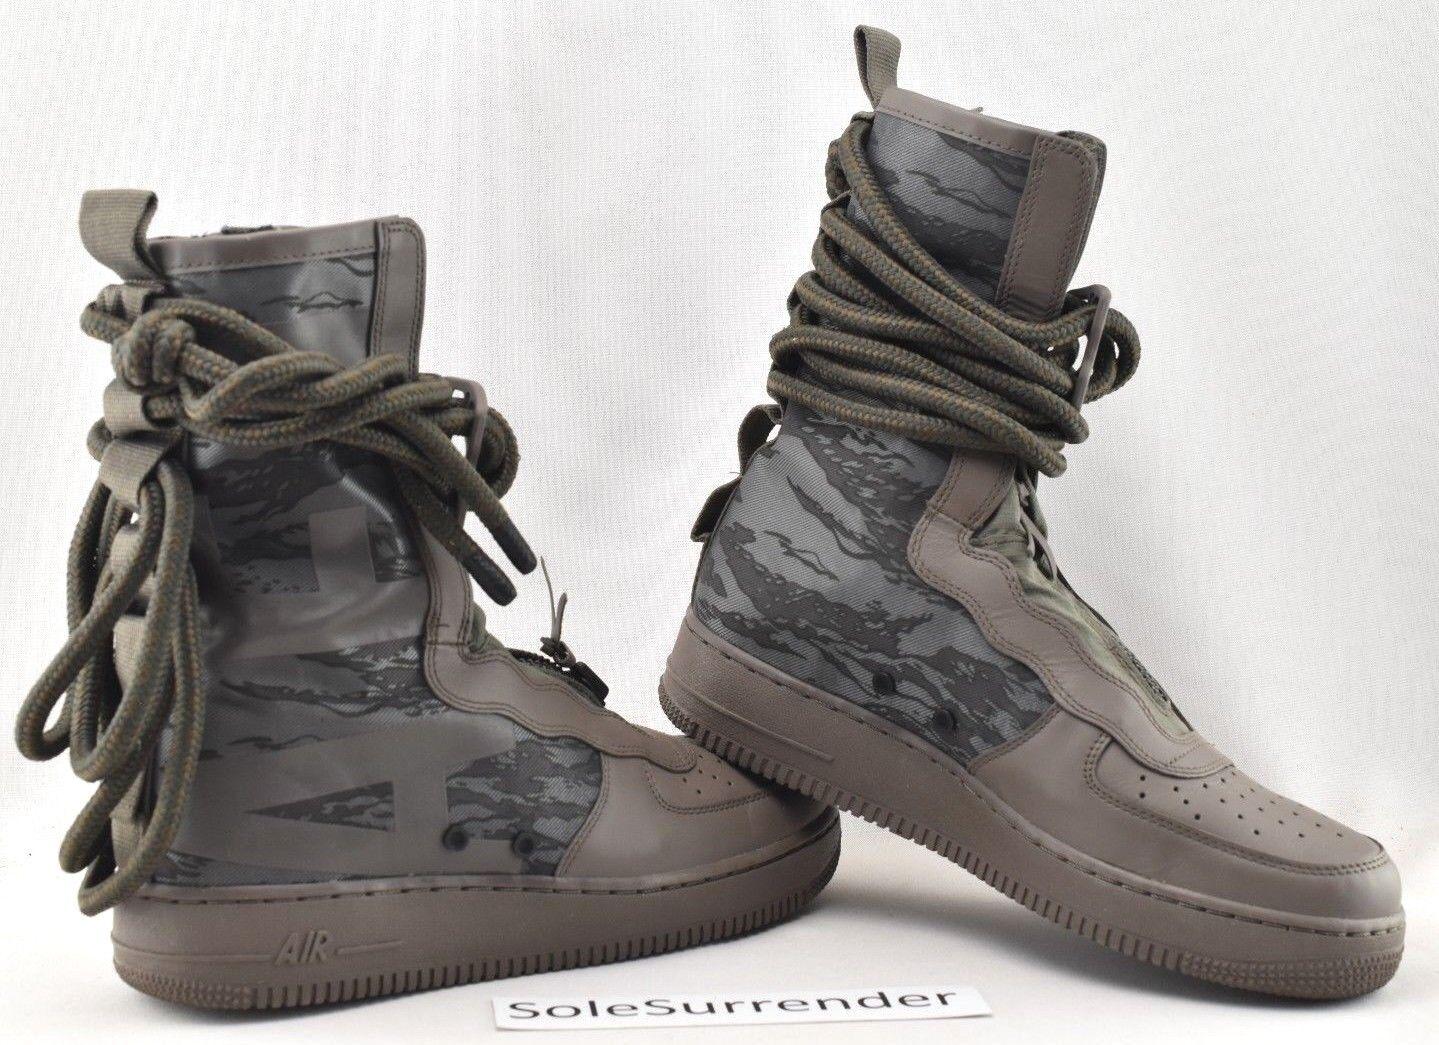 Nike SF AF1 Hi - SIZE 9.5 - AA1128-203 Special Field 1 Camo Ridgerock Black Grey